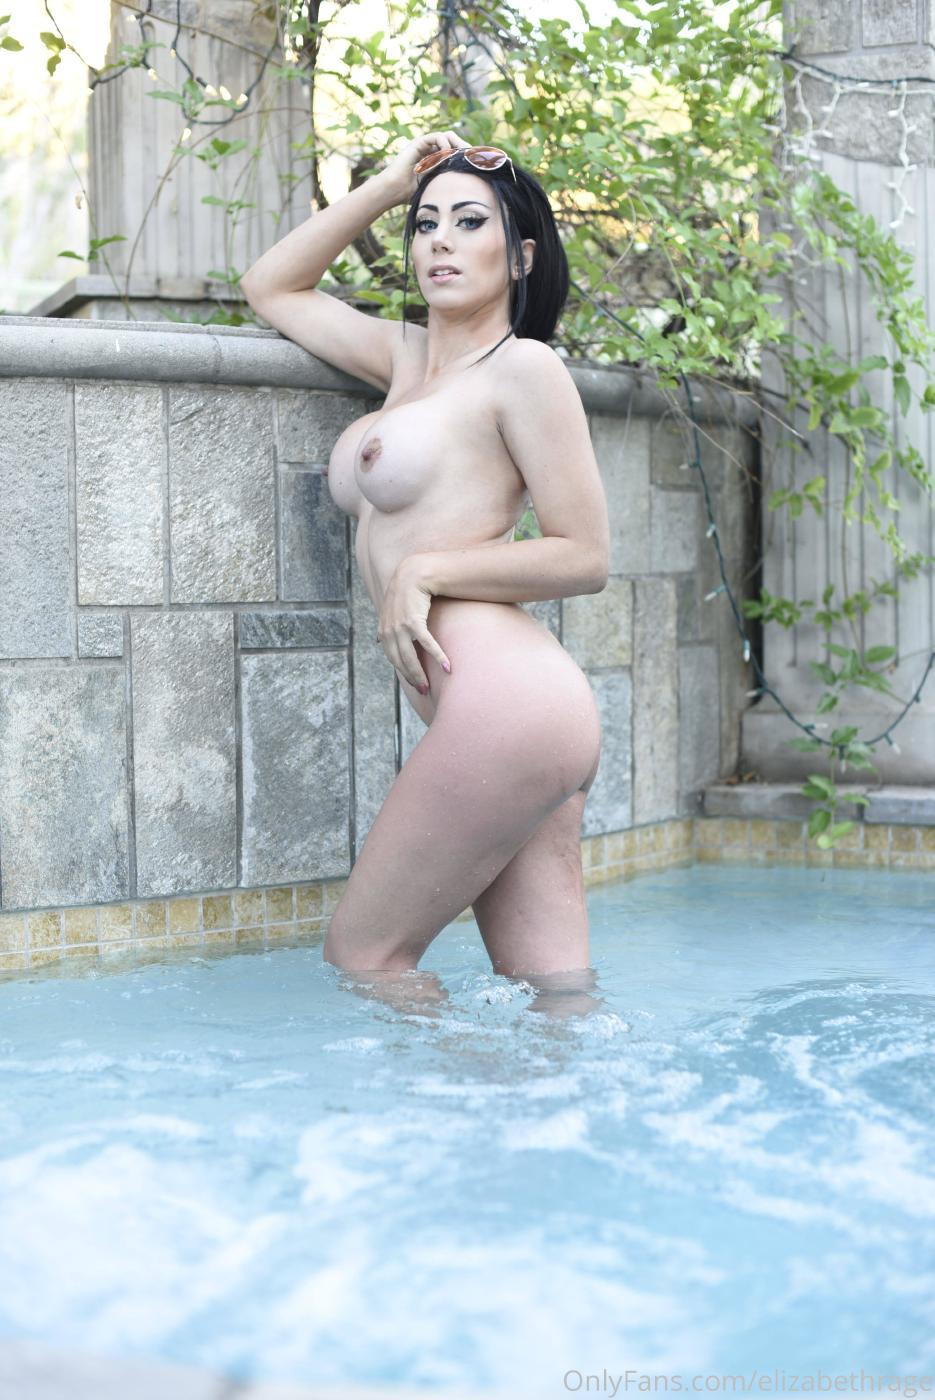 Elizabeth Rage Nude Outdoor Pool Onlyfans Set Leaked 0020